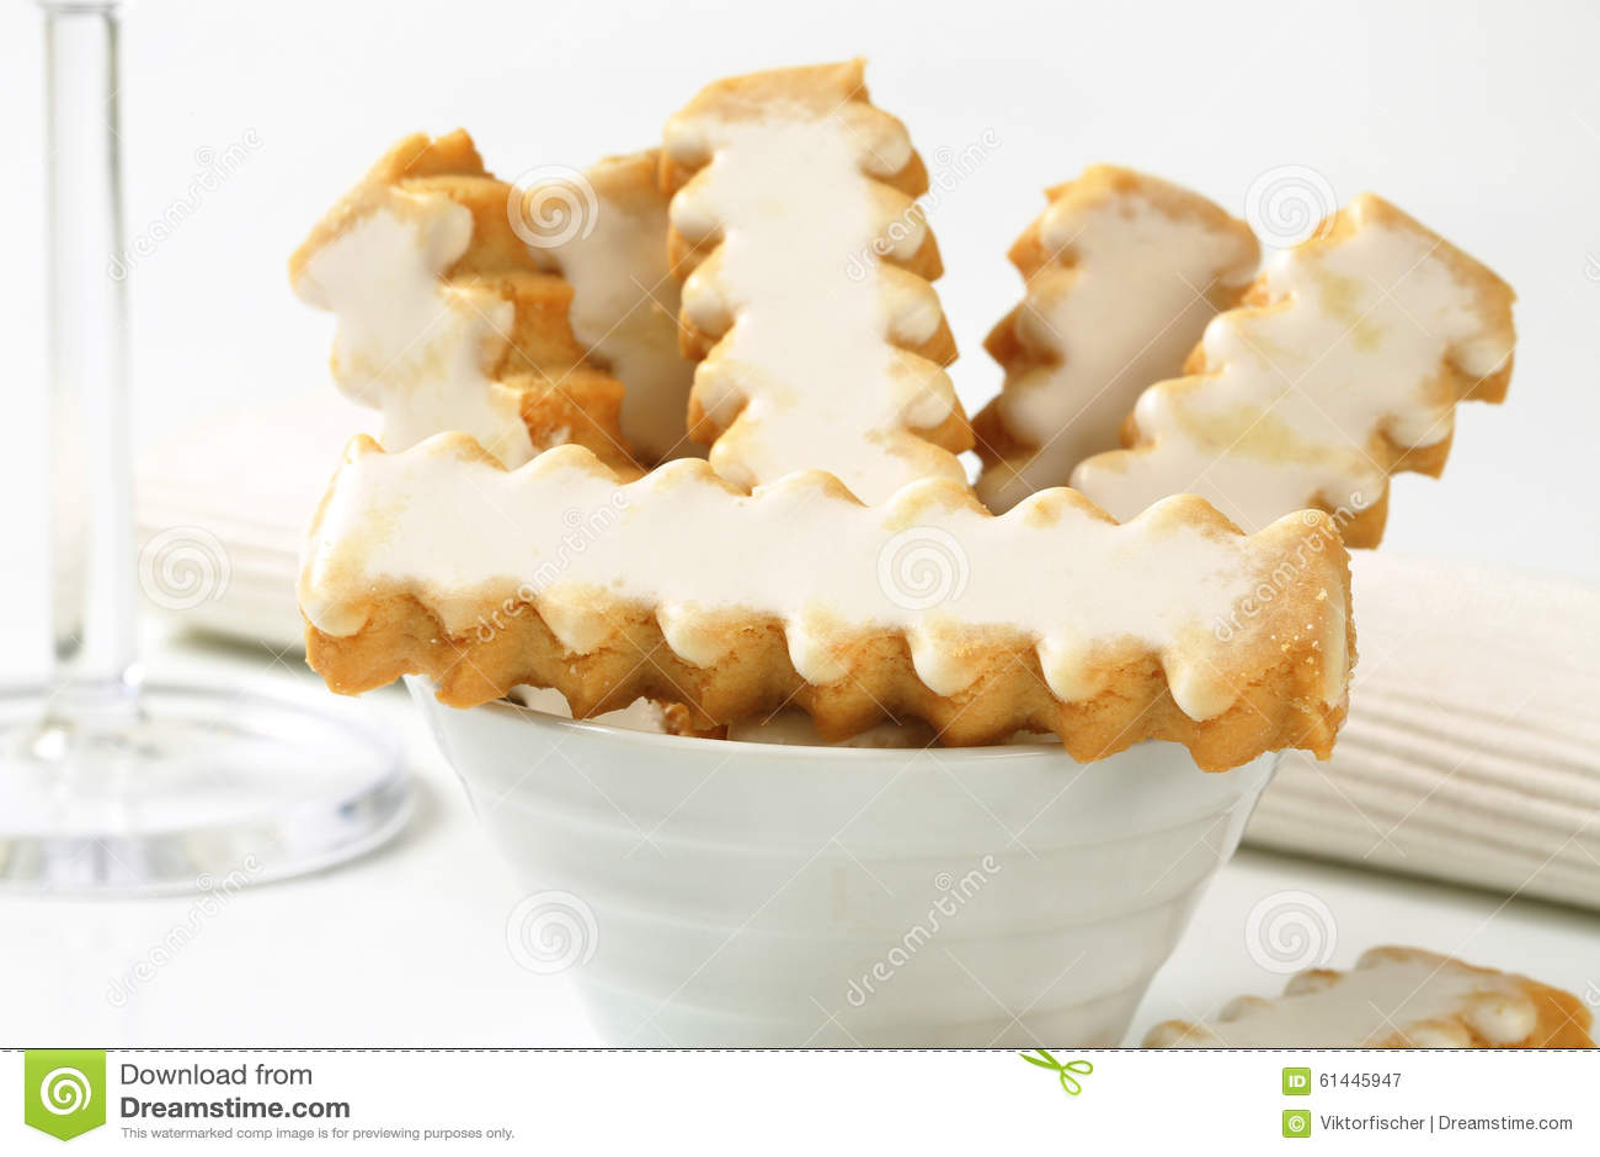 Glazed Cookies Stock Photo - Image: 61445947